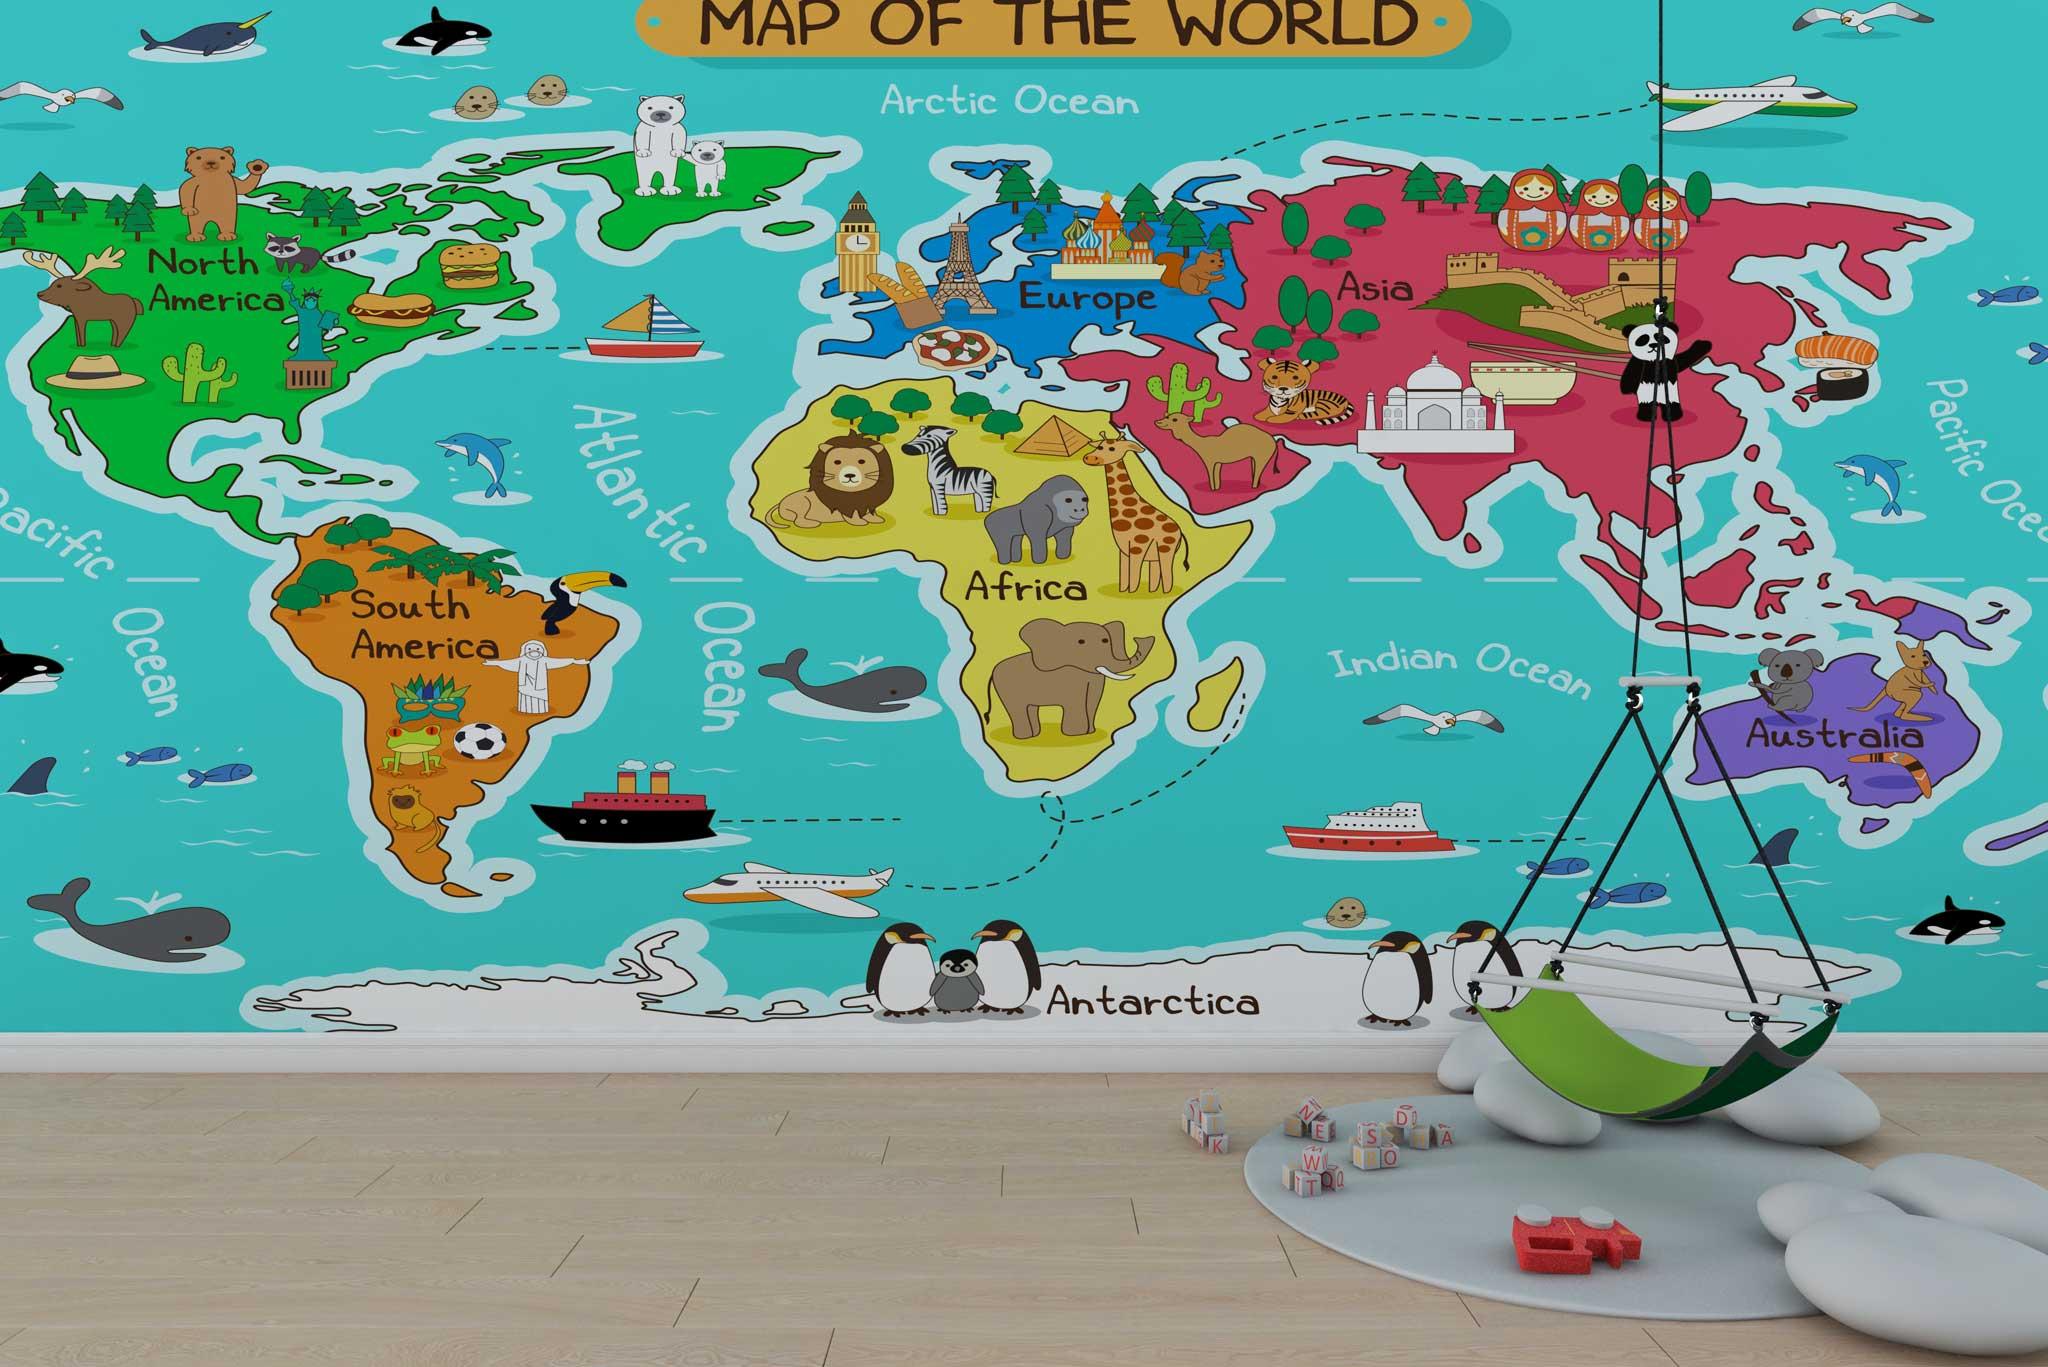 tapet-fototapet-design-personalizat-customizabil-comanda-special-camera-dormitor-copii-model-desen-harta-lumii-explorator-multicolor